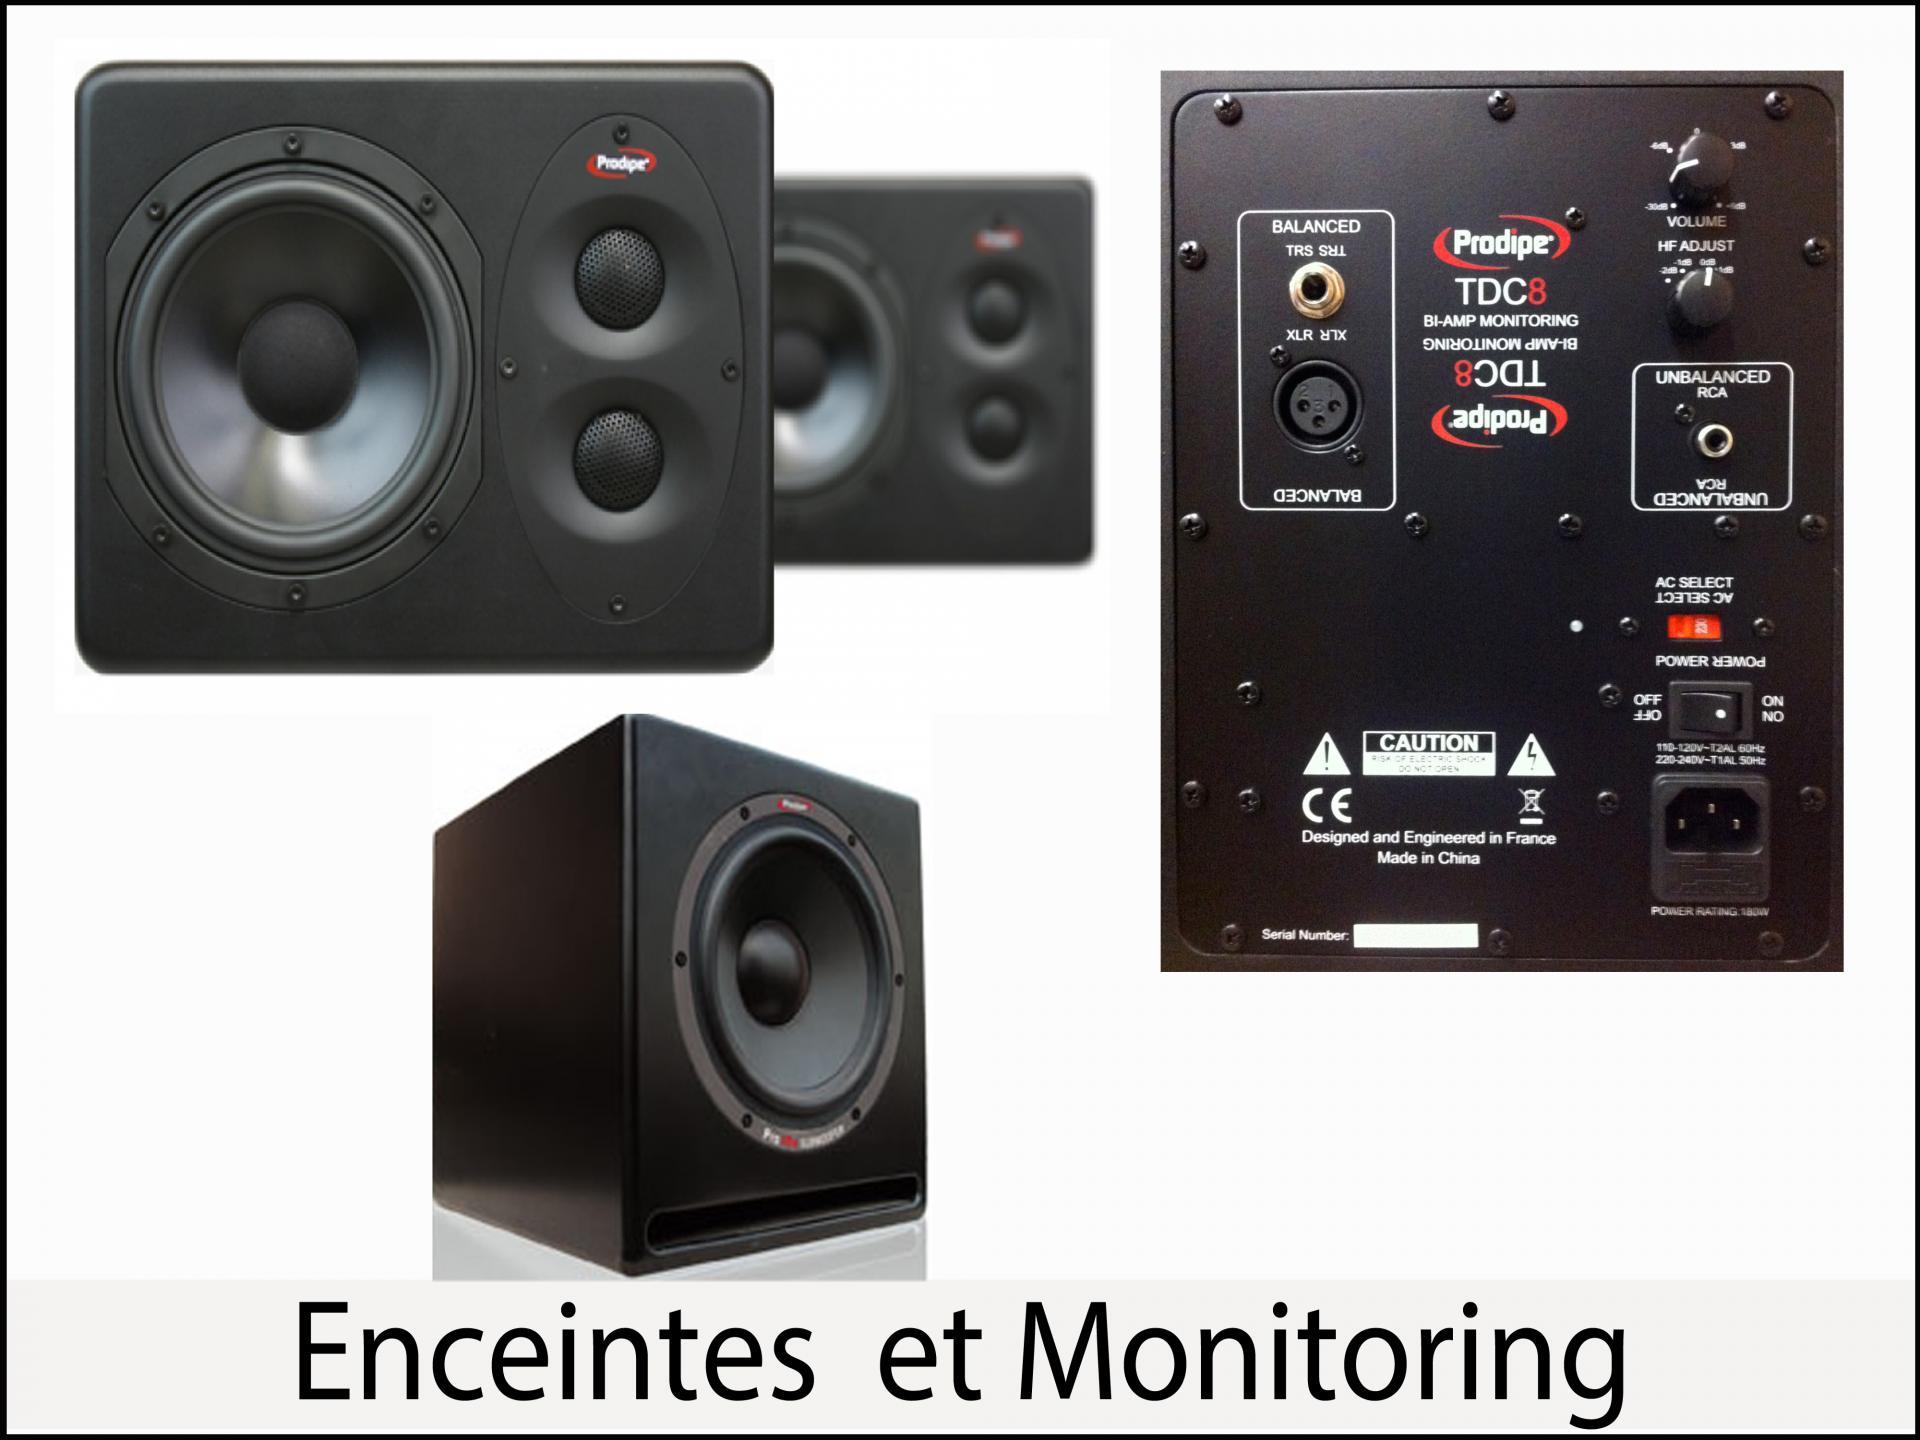 Enceintes et monitoring